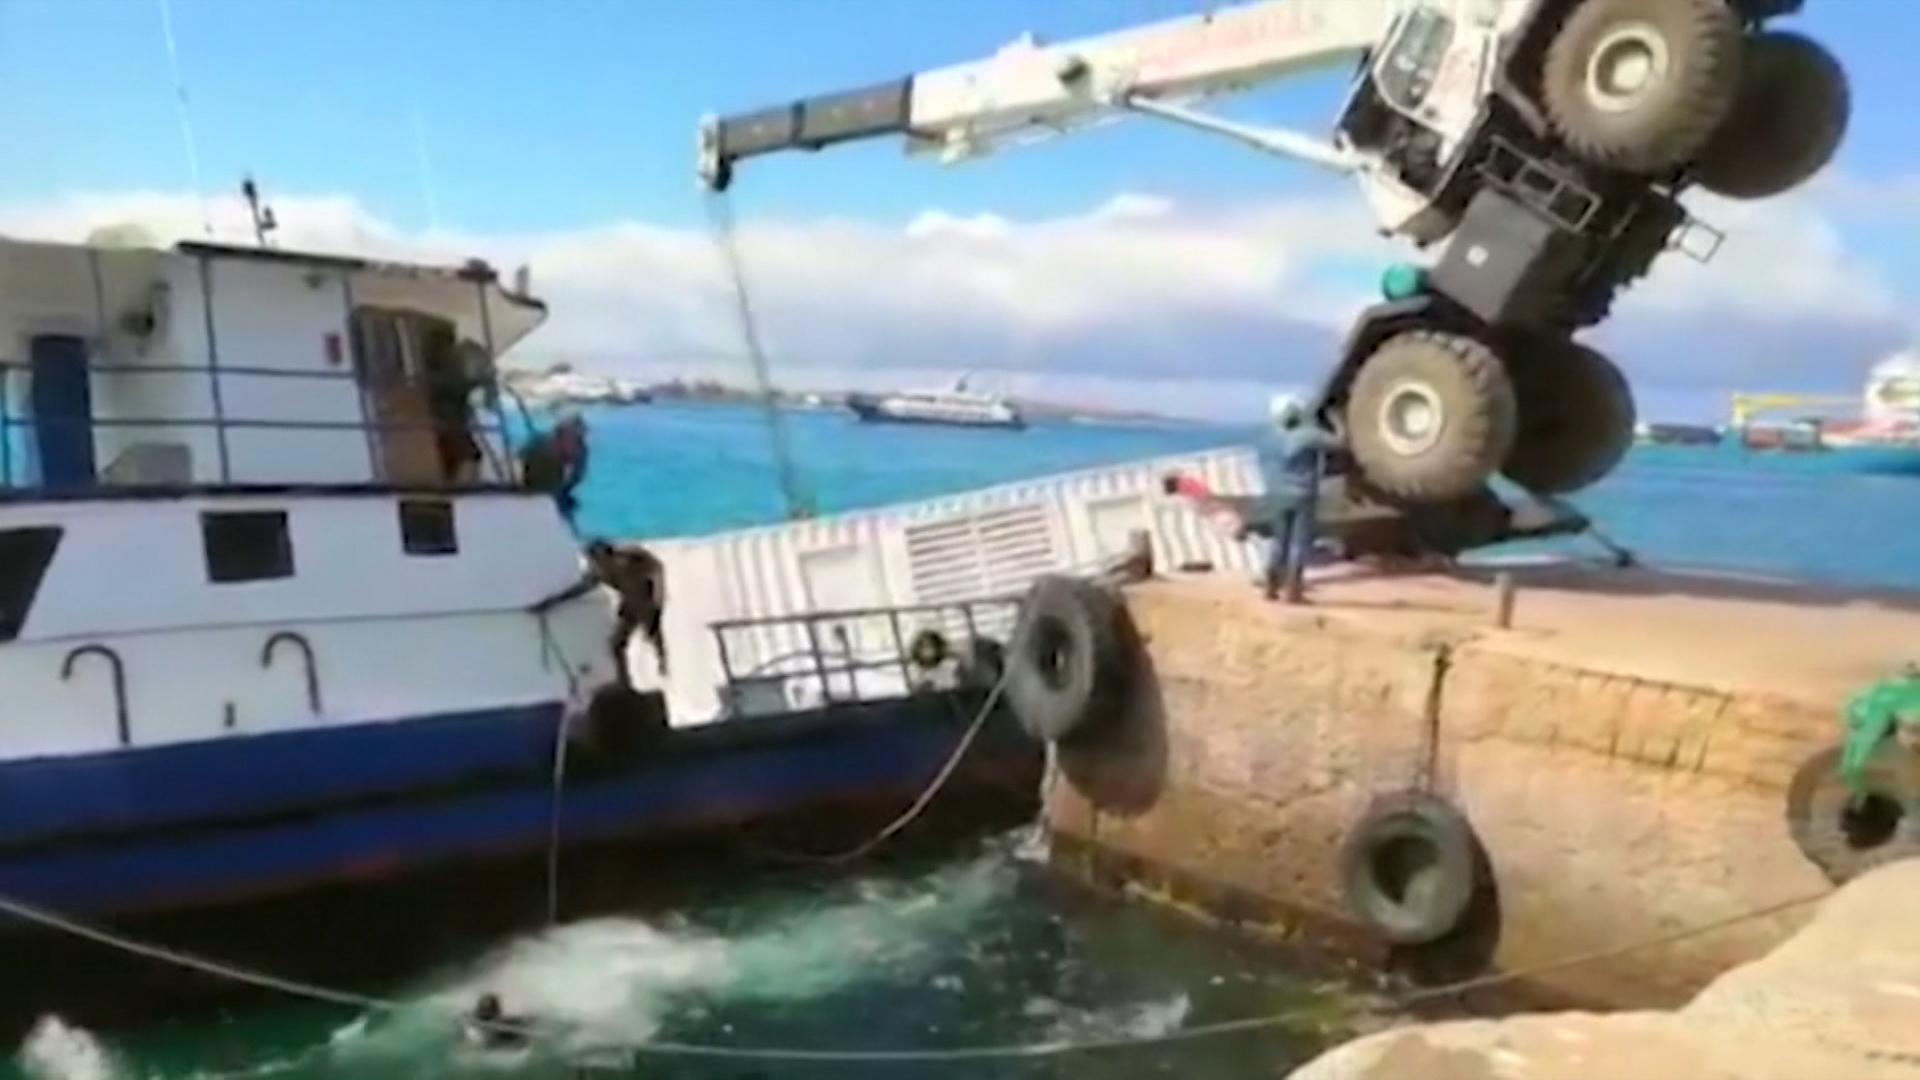 Galapagos-Inseln: Ecuador ruft nach Diesel-Austritt Notstand aus